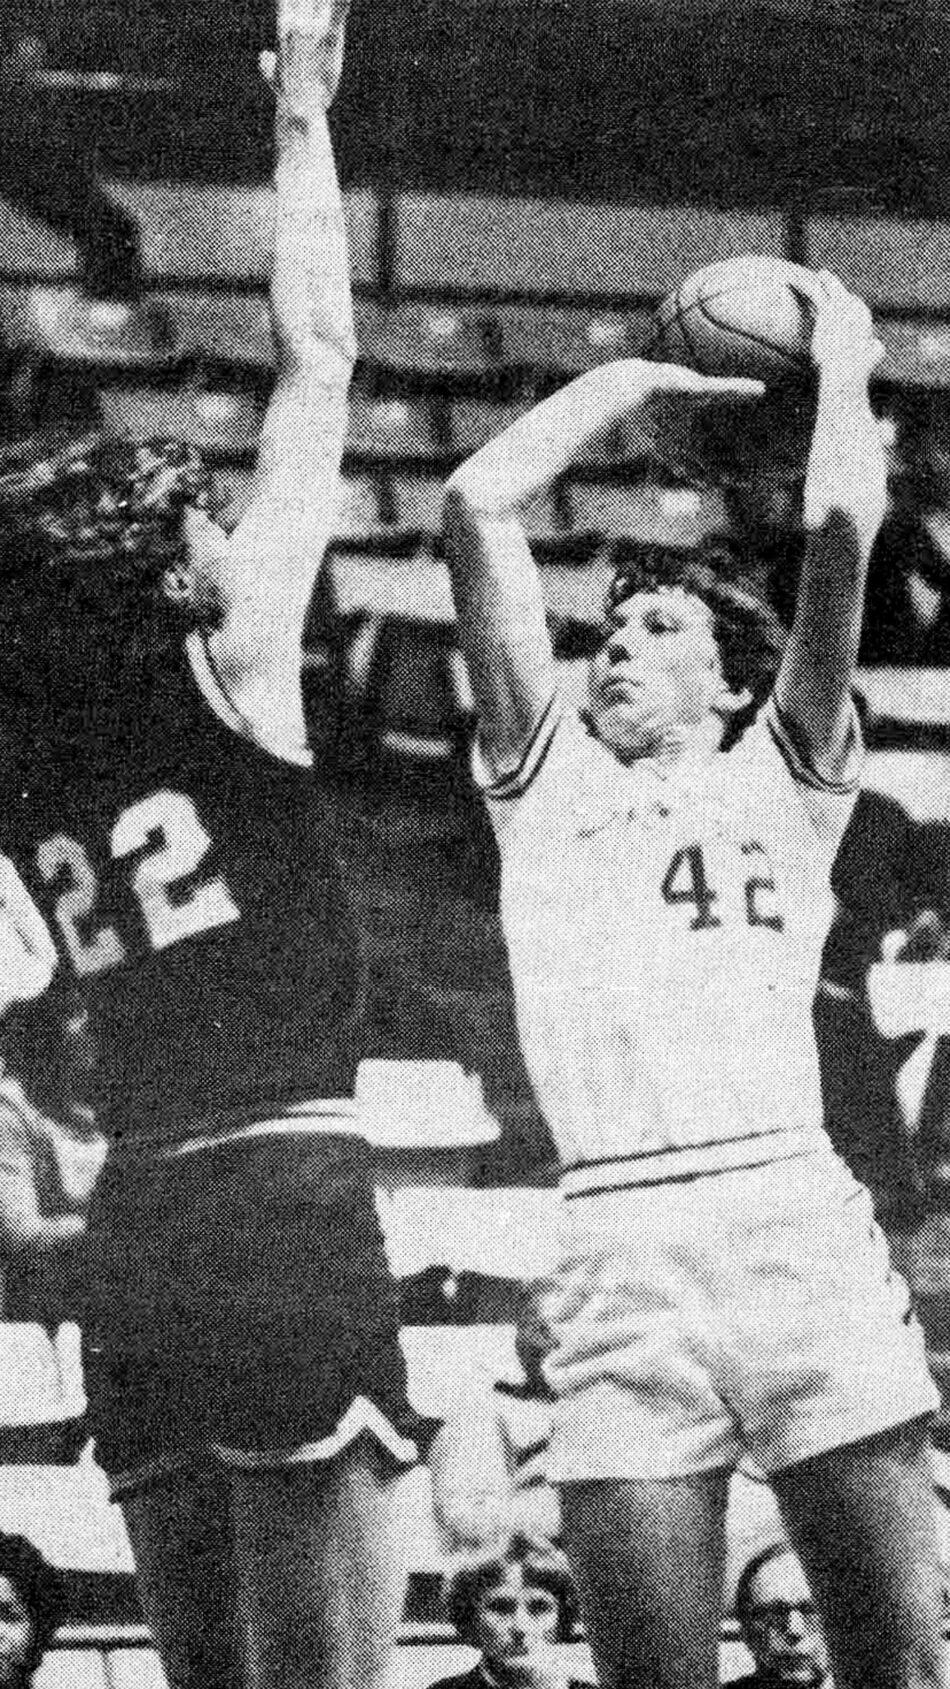 Newspaper photo of Jeanette Tendai shooting a basketball